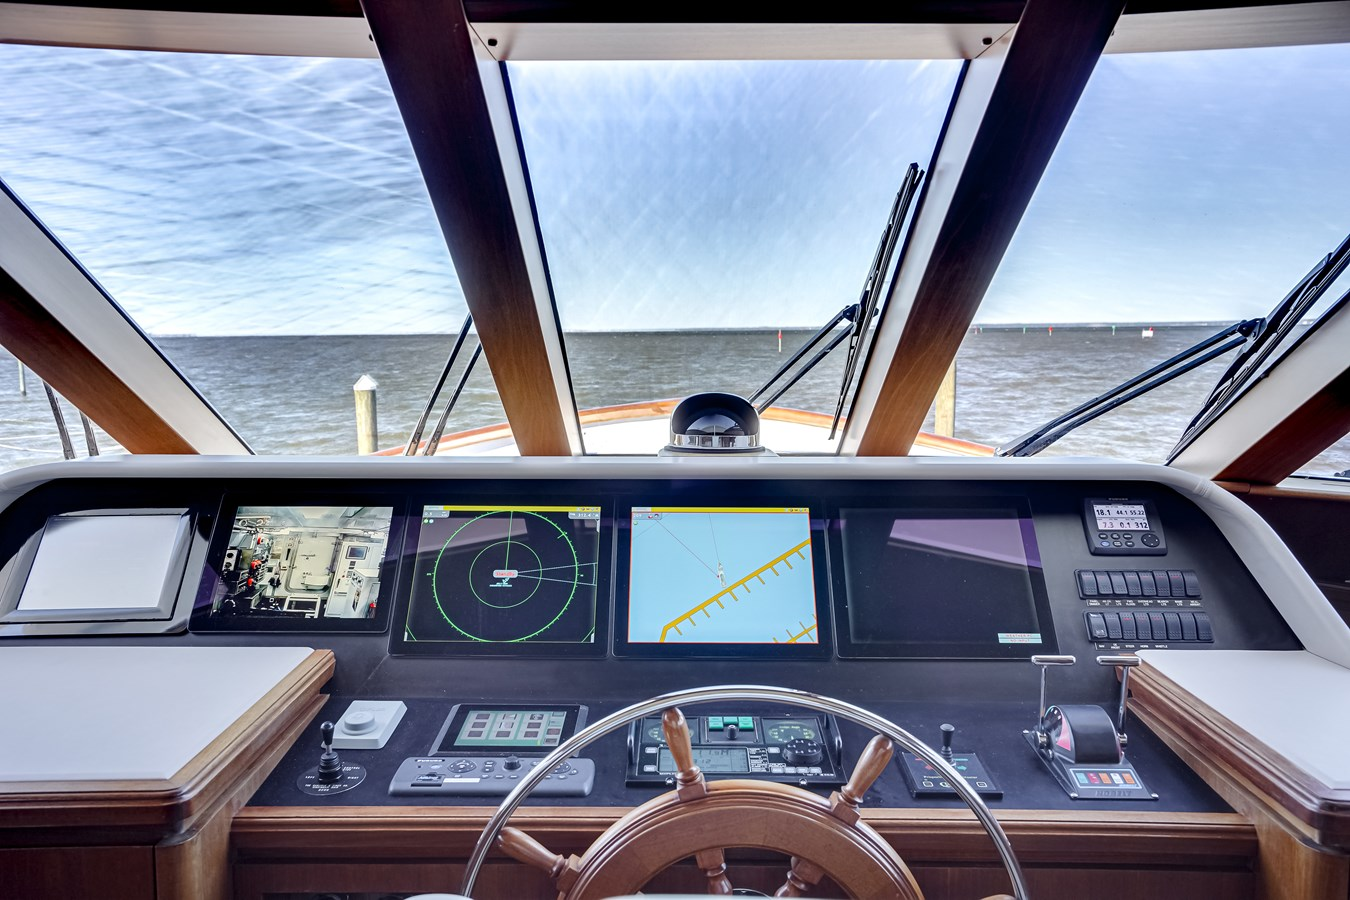 2011 85 Burger - Pilothouse Helm (1) 2001 BURGER 85 Motor Yacht Motor Yacht 2847196